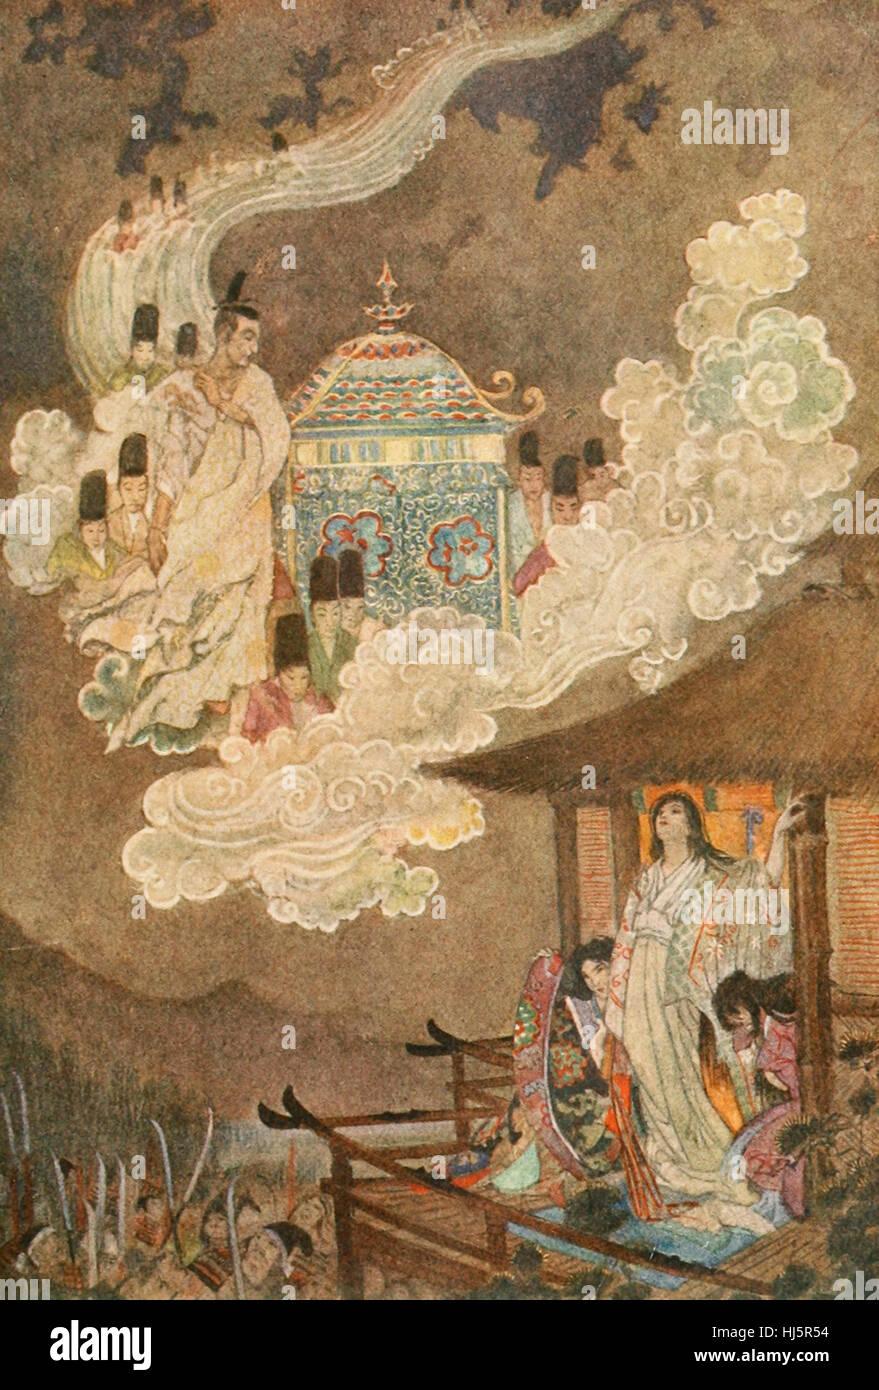 The Moonfolk demand the Lady Kaguya. Japanese Folklore - Stock Image